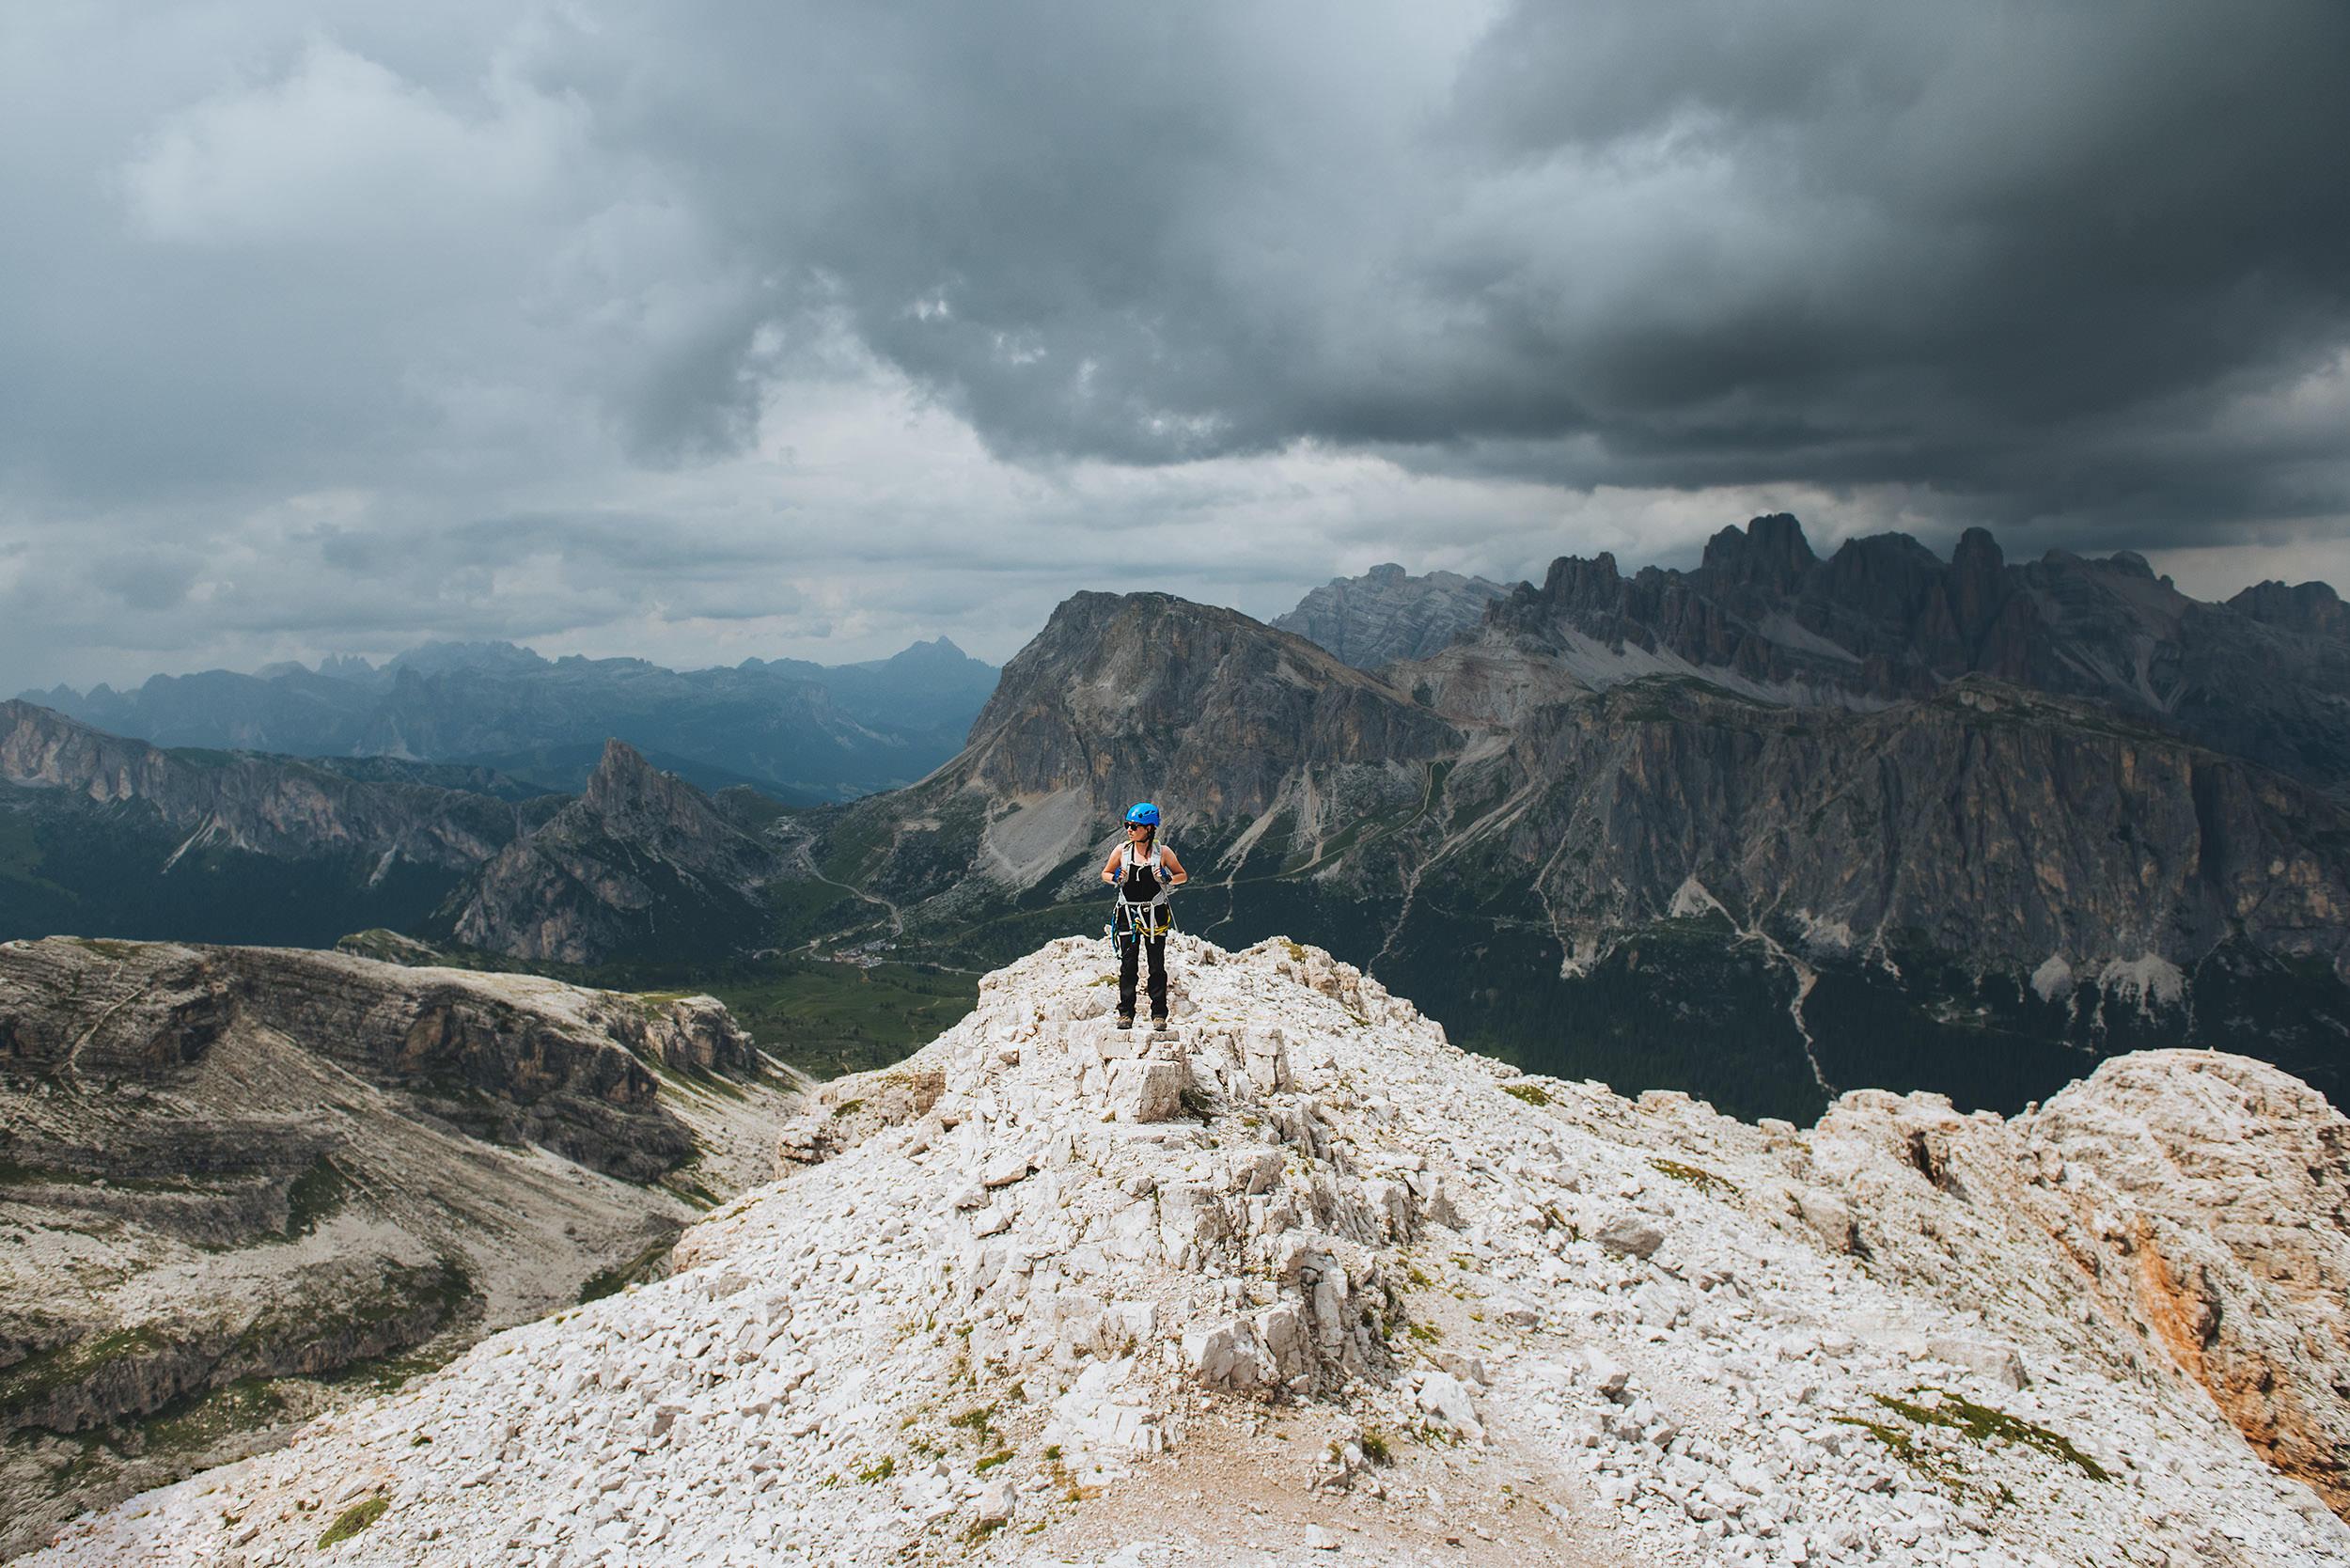 18-outdoor-adventure-mountains-via-ferrata-climbing-italy-dolomites.jpg